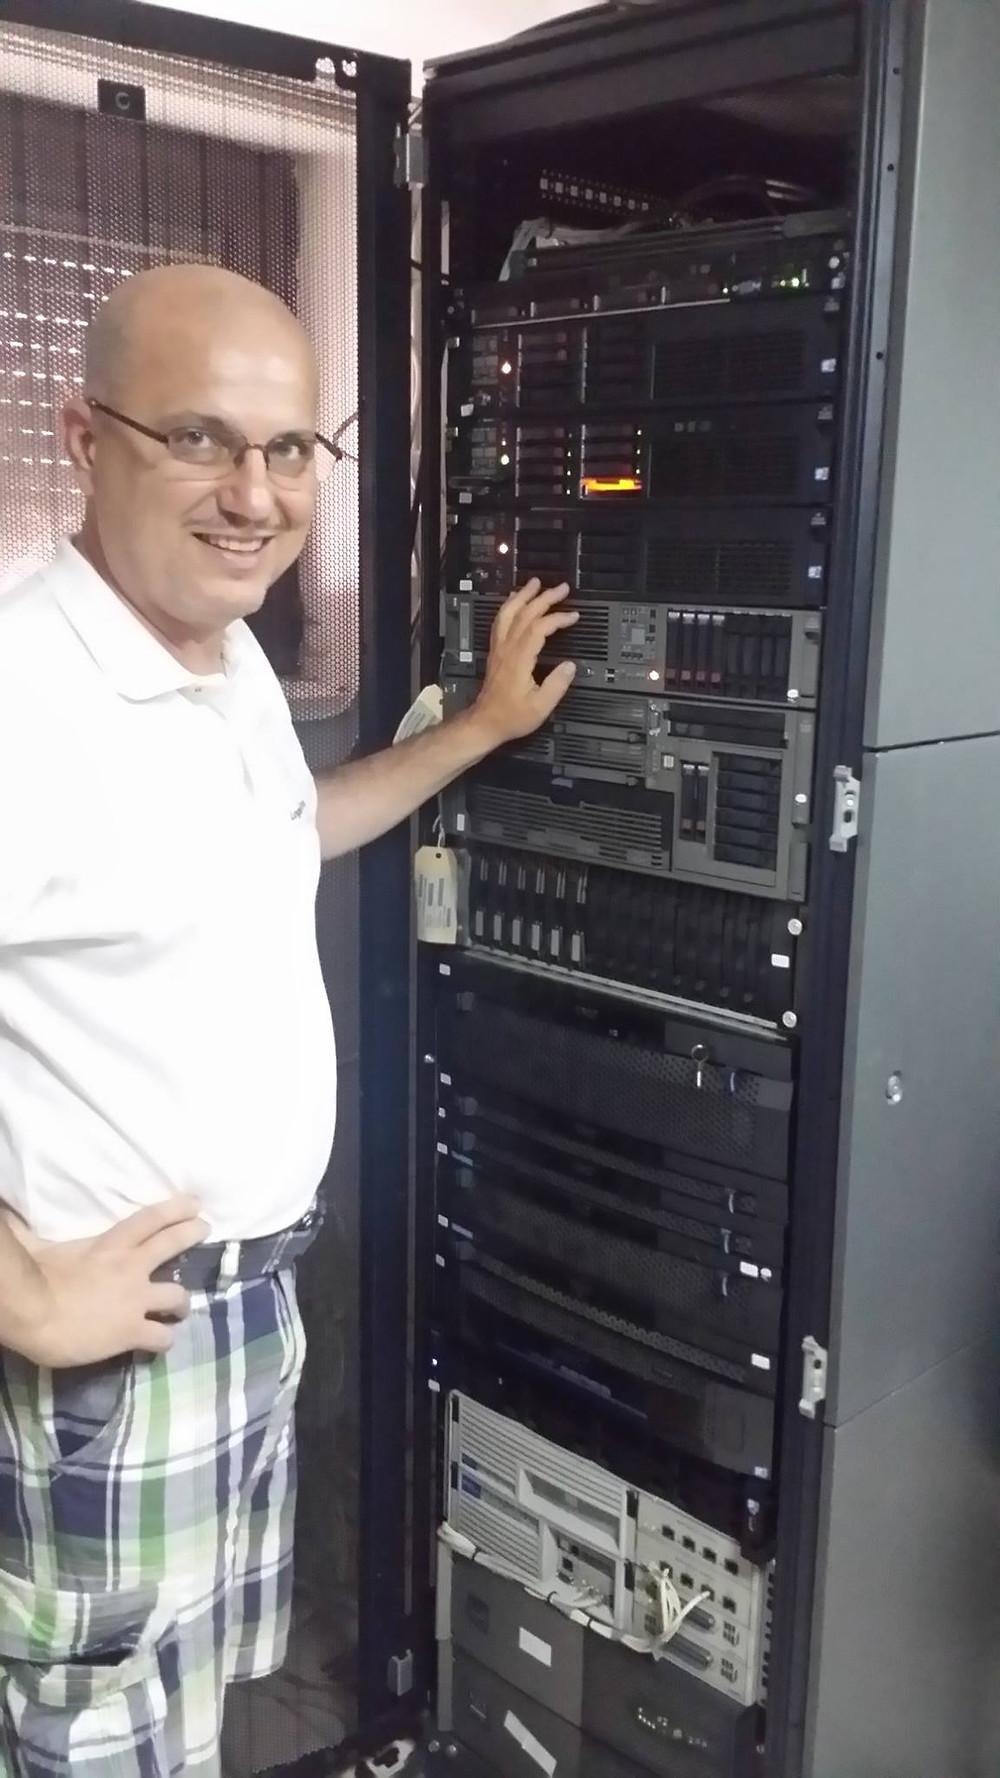 Венко Глигоров со серверскиот систем